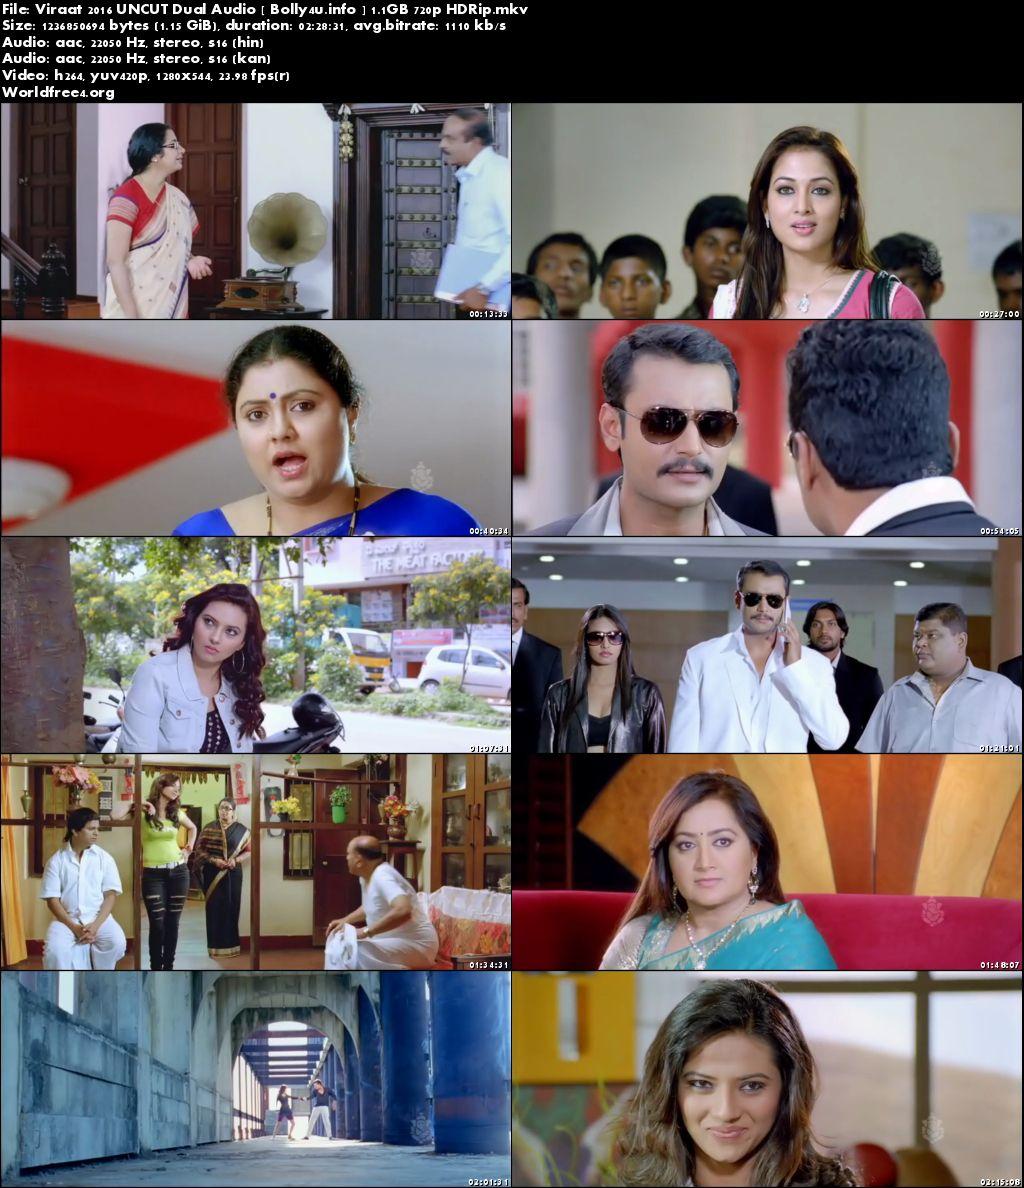 Screen Shoots of Watch Online Viraat 2016 HDRip 1.1Gb UNCUT Hindi Dual Audio 720p Free Download Bolly4u.info